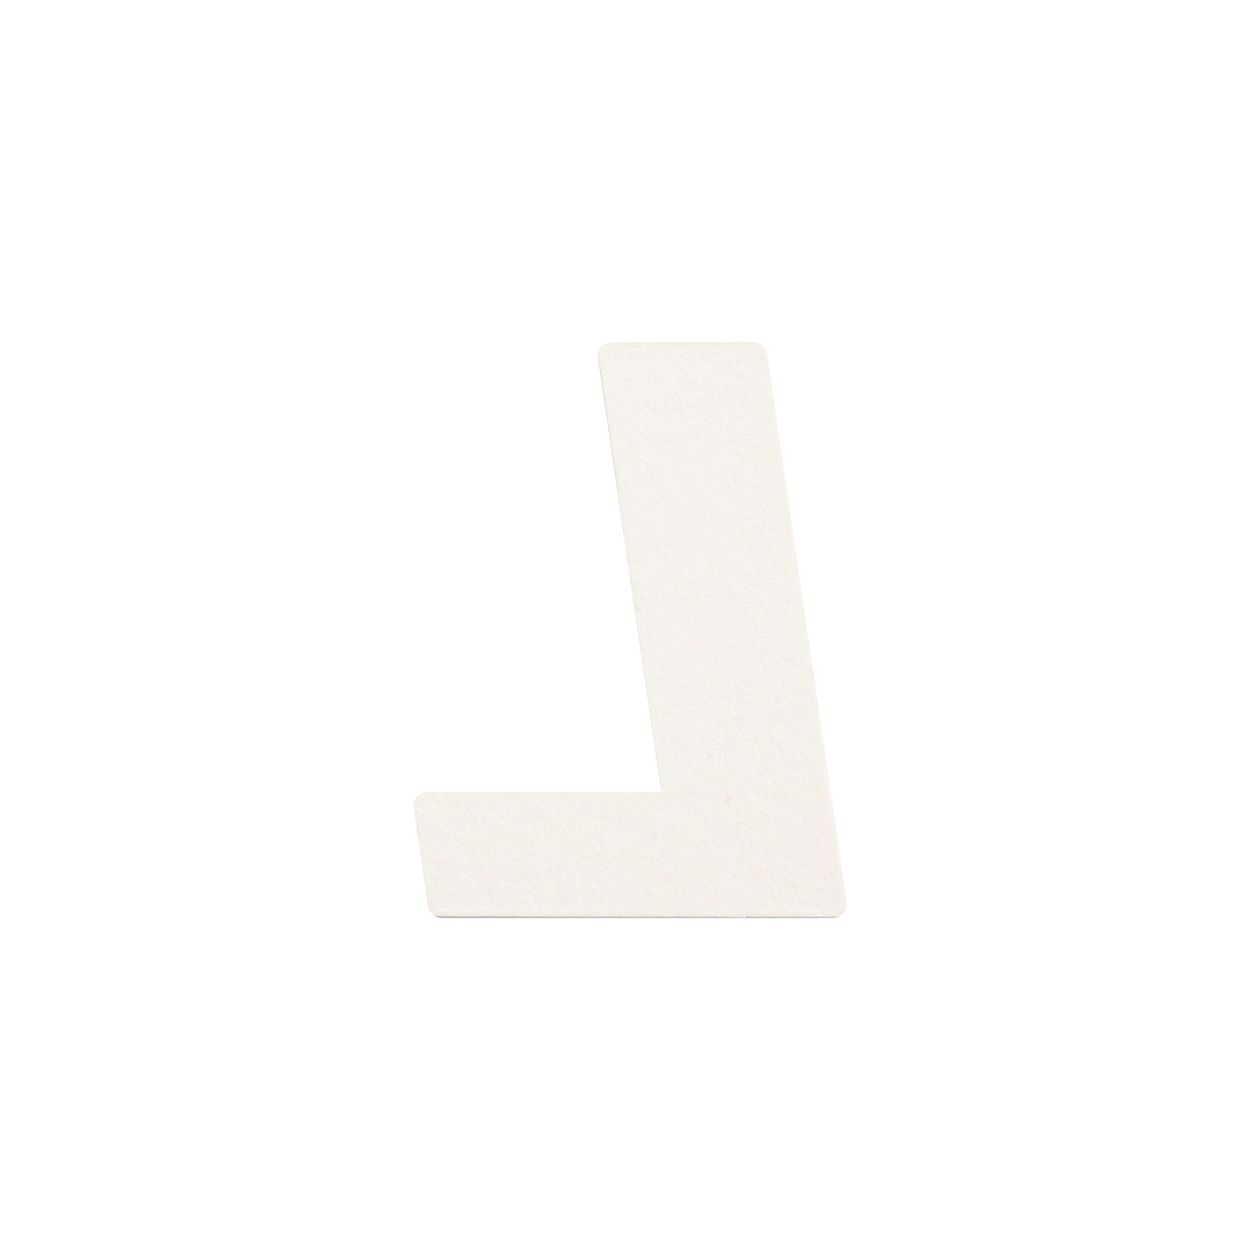 No.395ボード A7カードDC 文字L シルバー